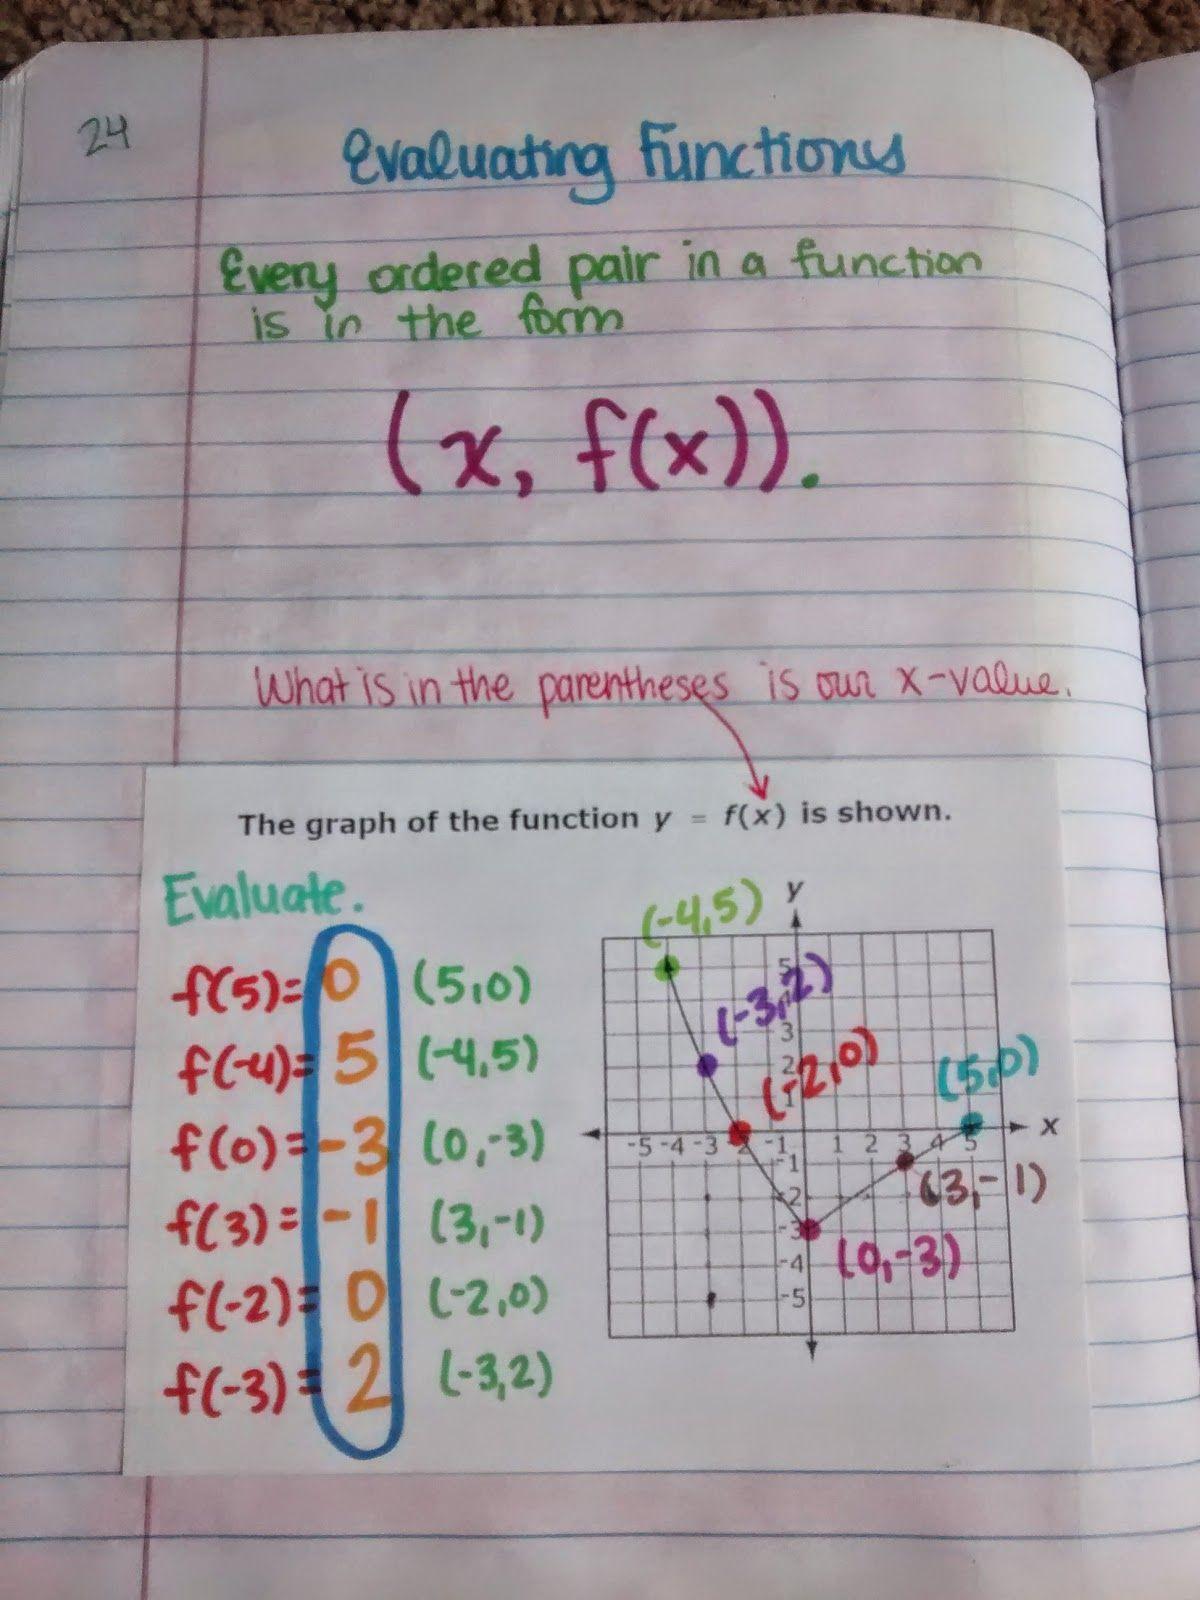 2014 2015 Algebra 1 Unit 1 Interactive Notebook Pages School Algebra Algebra 1 Education Math [ 1600 x 1200 Pixel ]